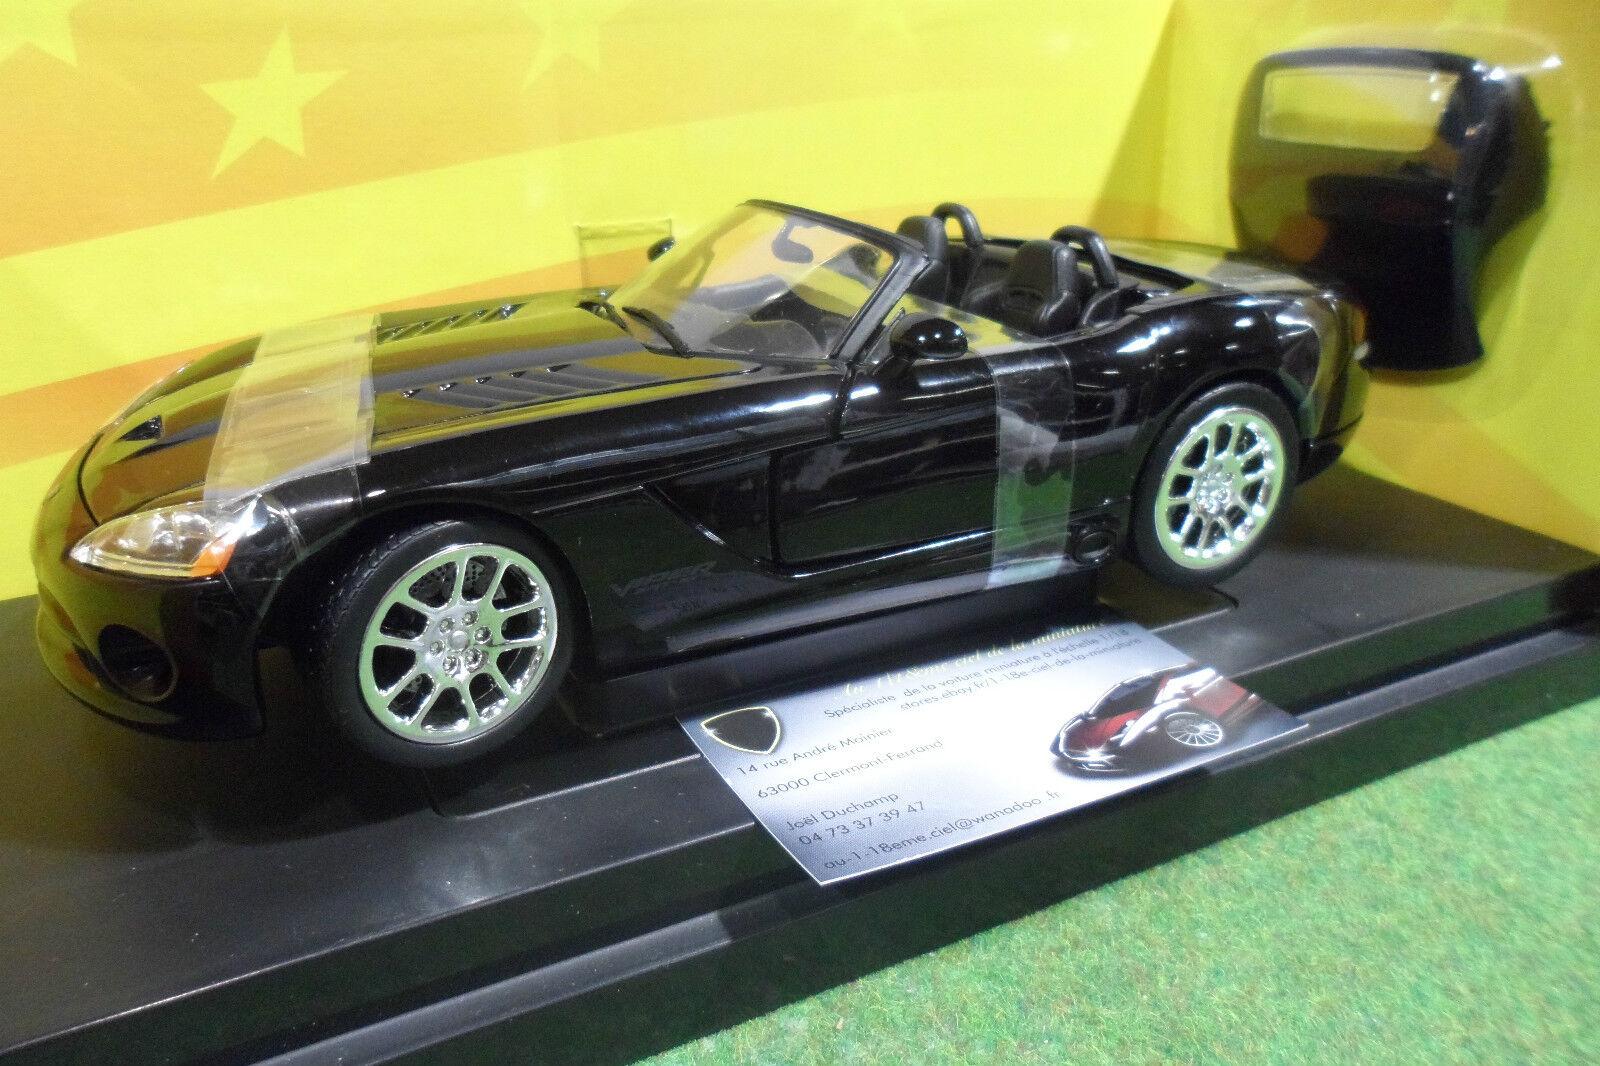 DODGE VIPER SRT-10 Cabriolet 1 18 d AMERICAN MUSCLE ERTL 33249 voiture miniature